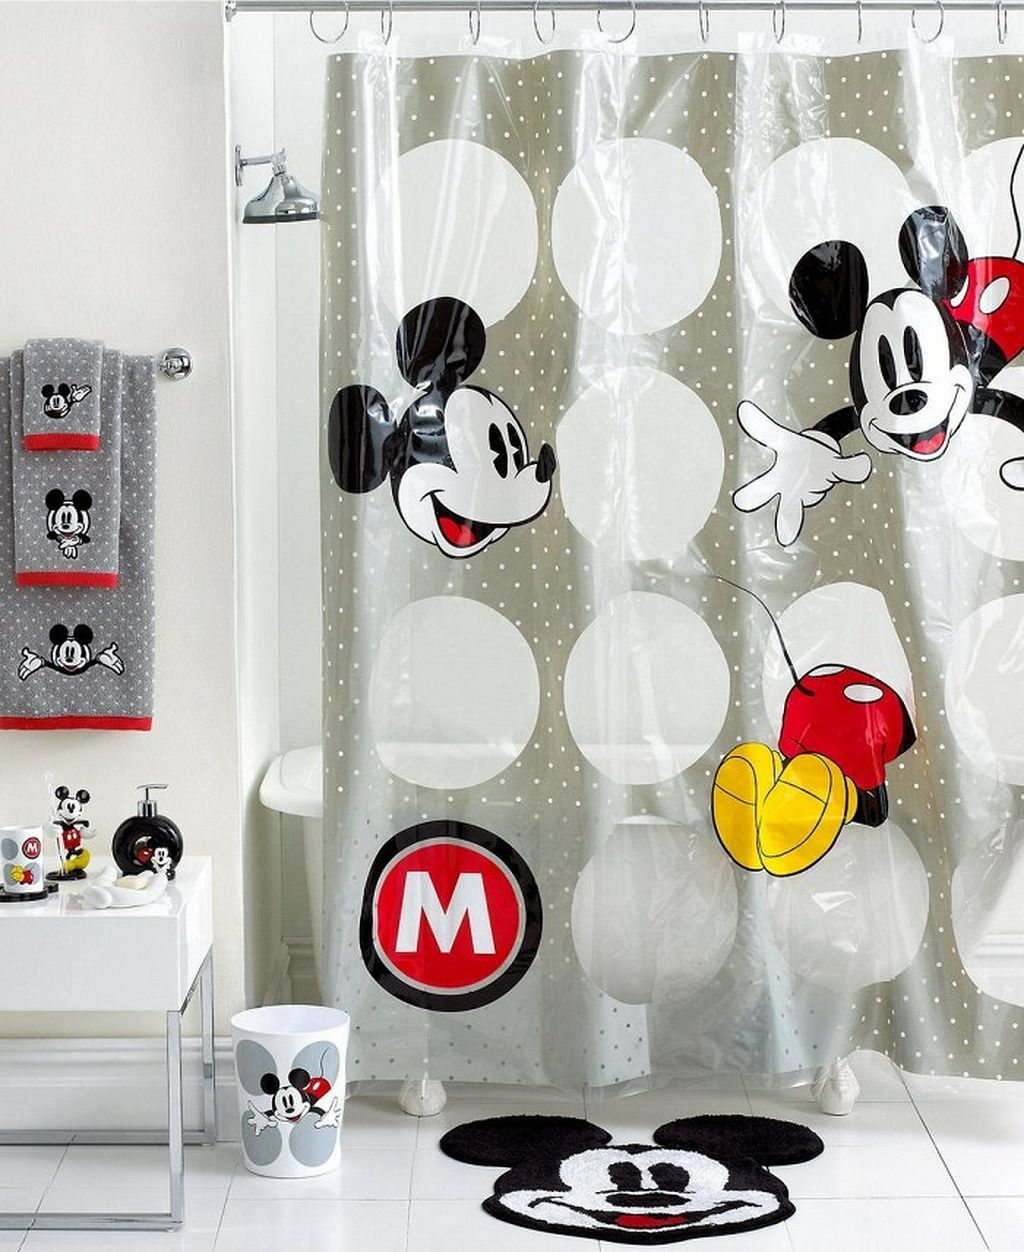 Gorgeous 30 Cool Kids Bathroom Ideas Https Kidmagz Com 30 Cool Kids Bathroom Ideas Kids Bathroom Sets Kids Shower Curtain Kids Bathroom